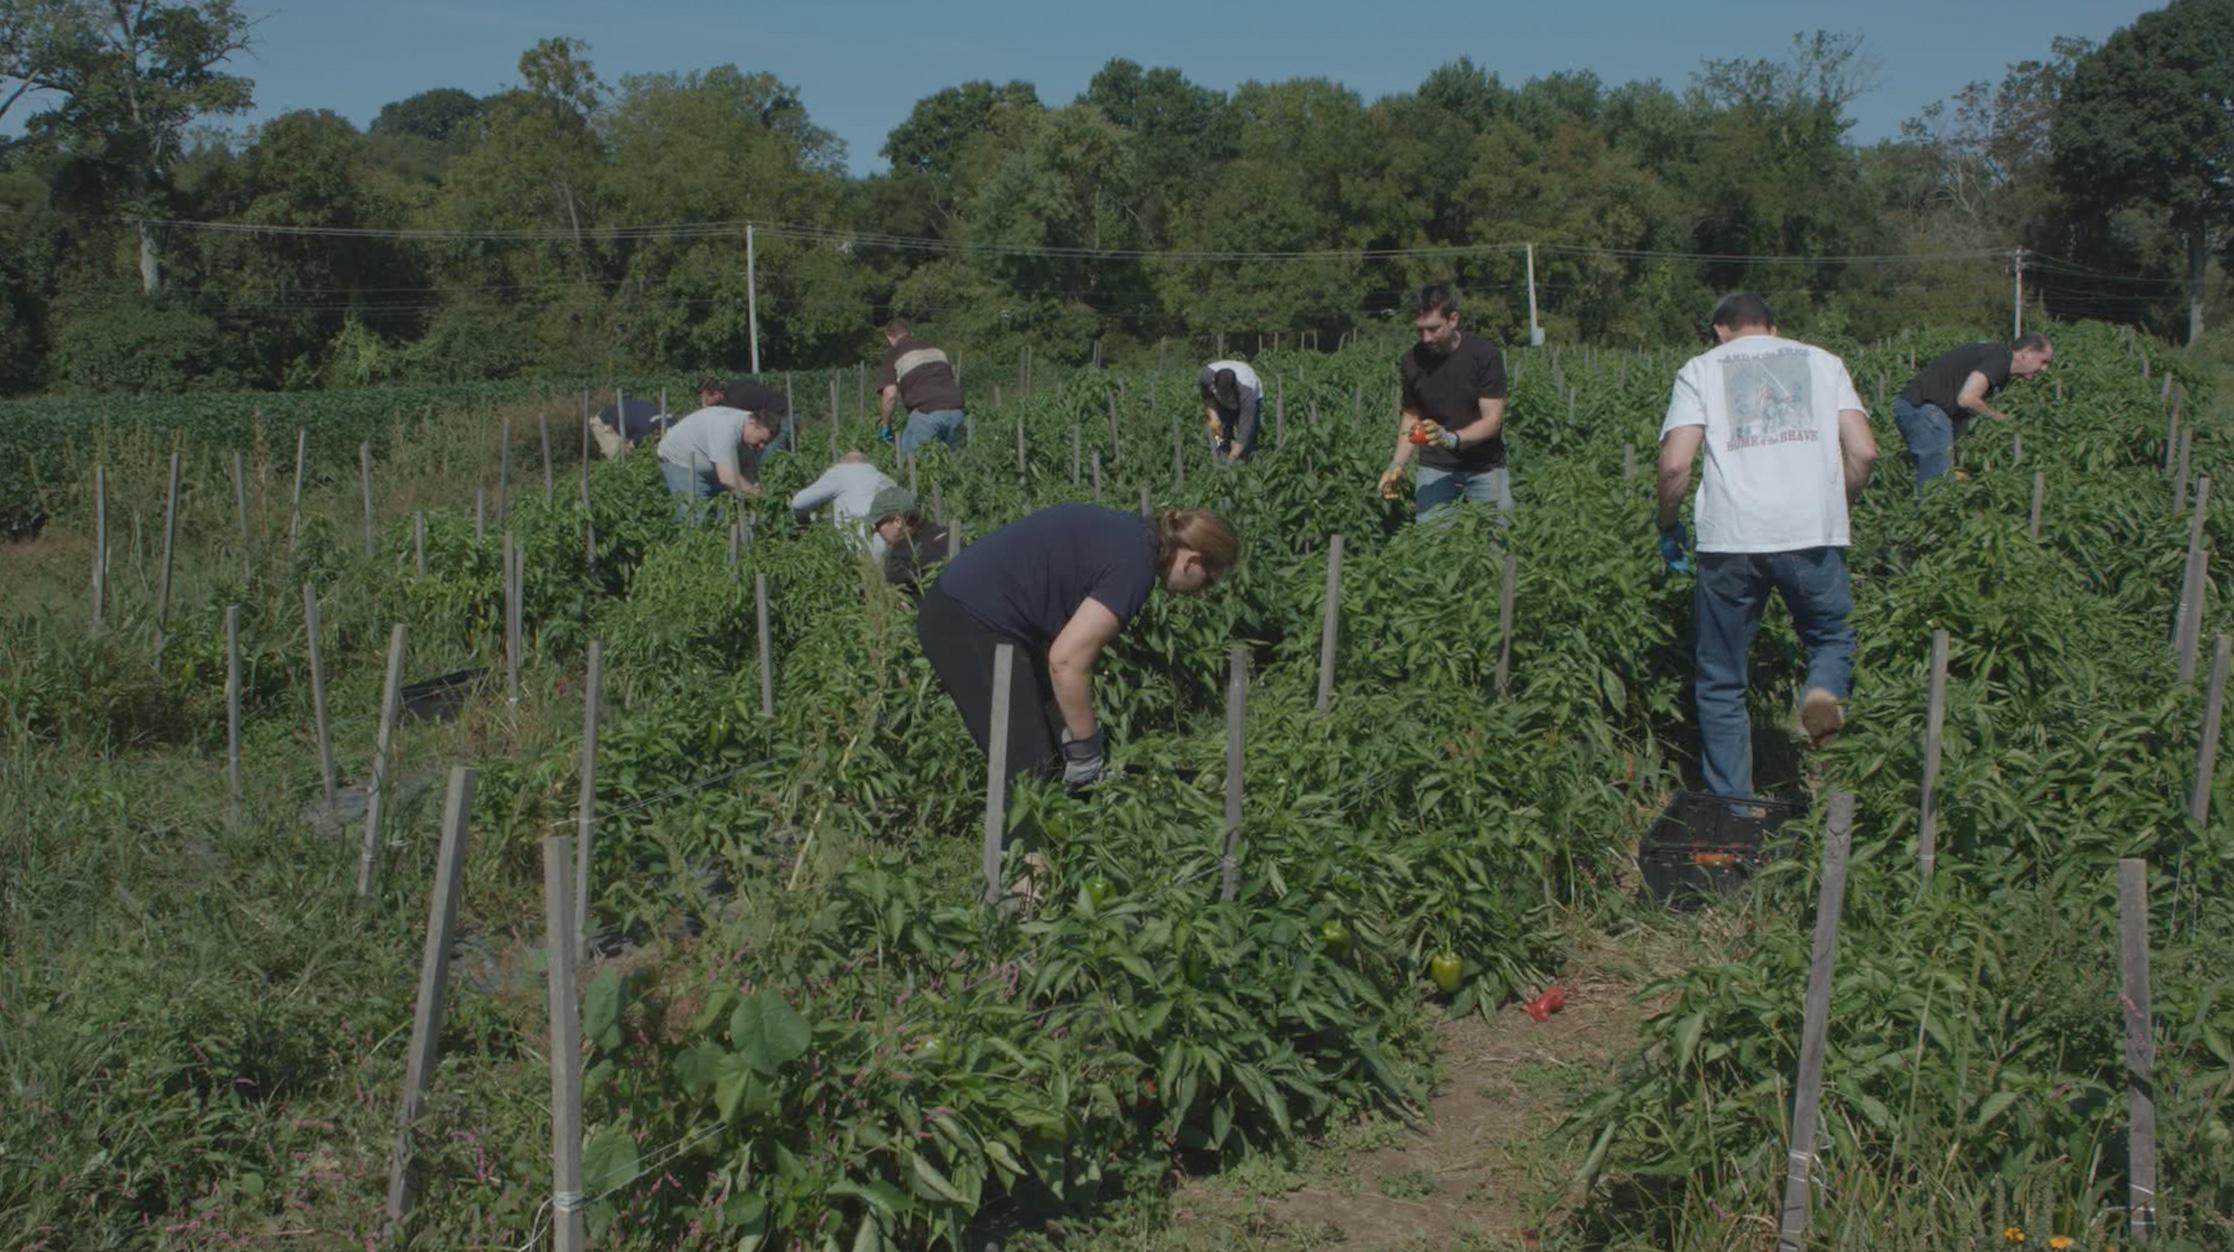 Petes Produce farm